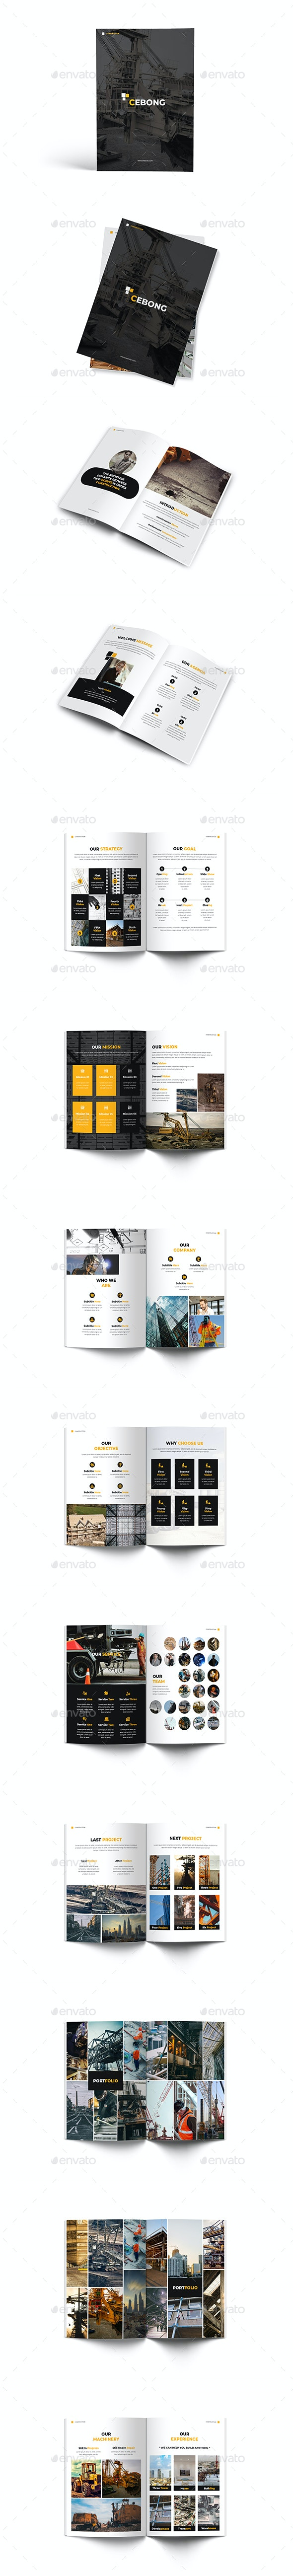 Construction A4 Brochure Template - Brochures Print Templates